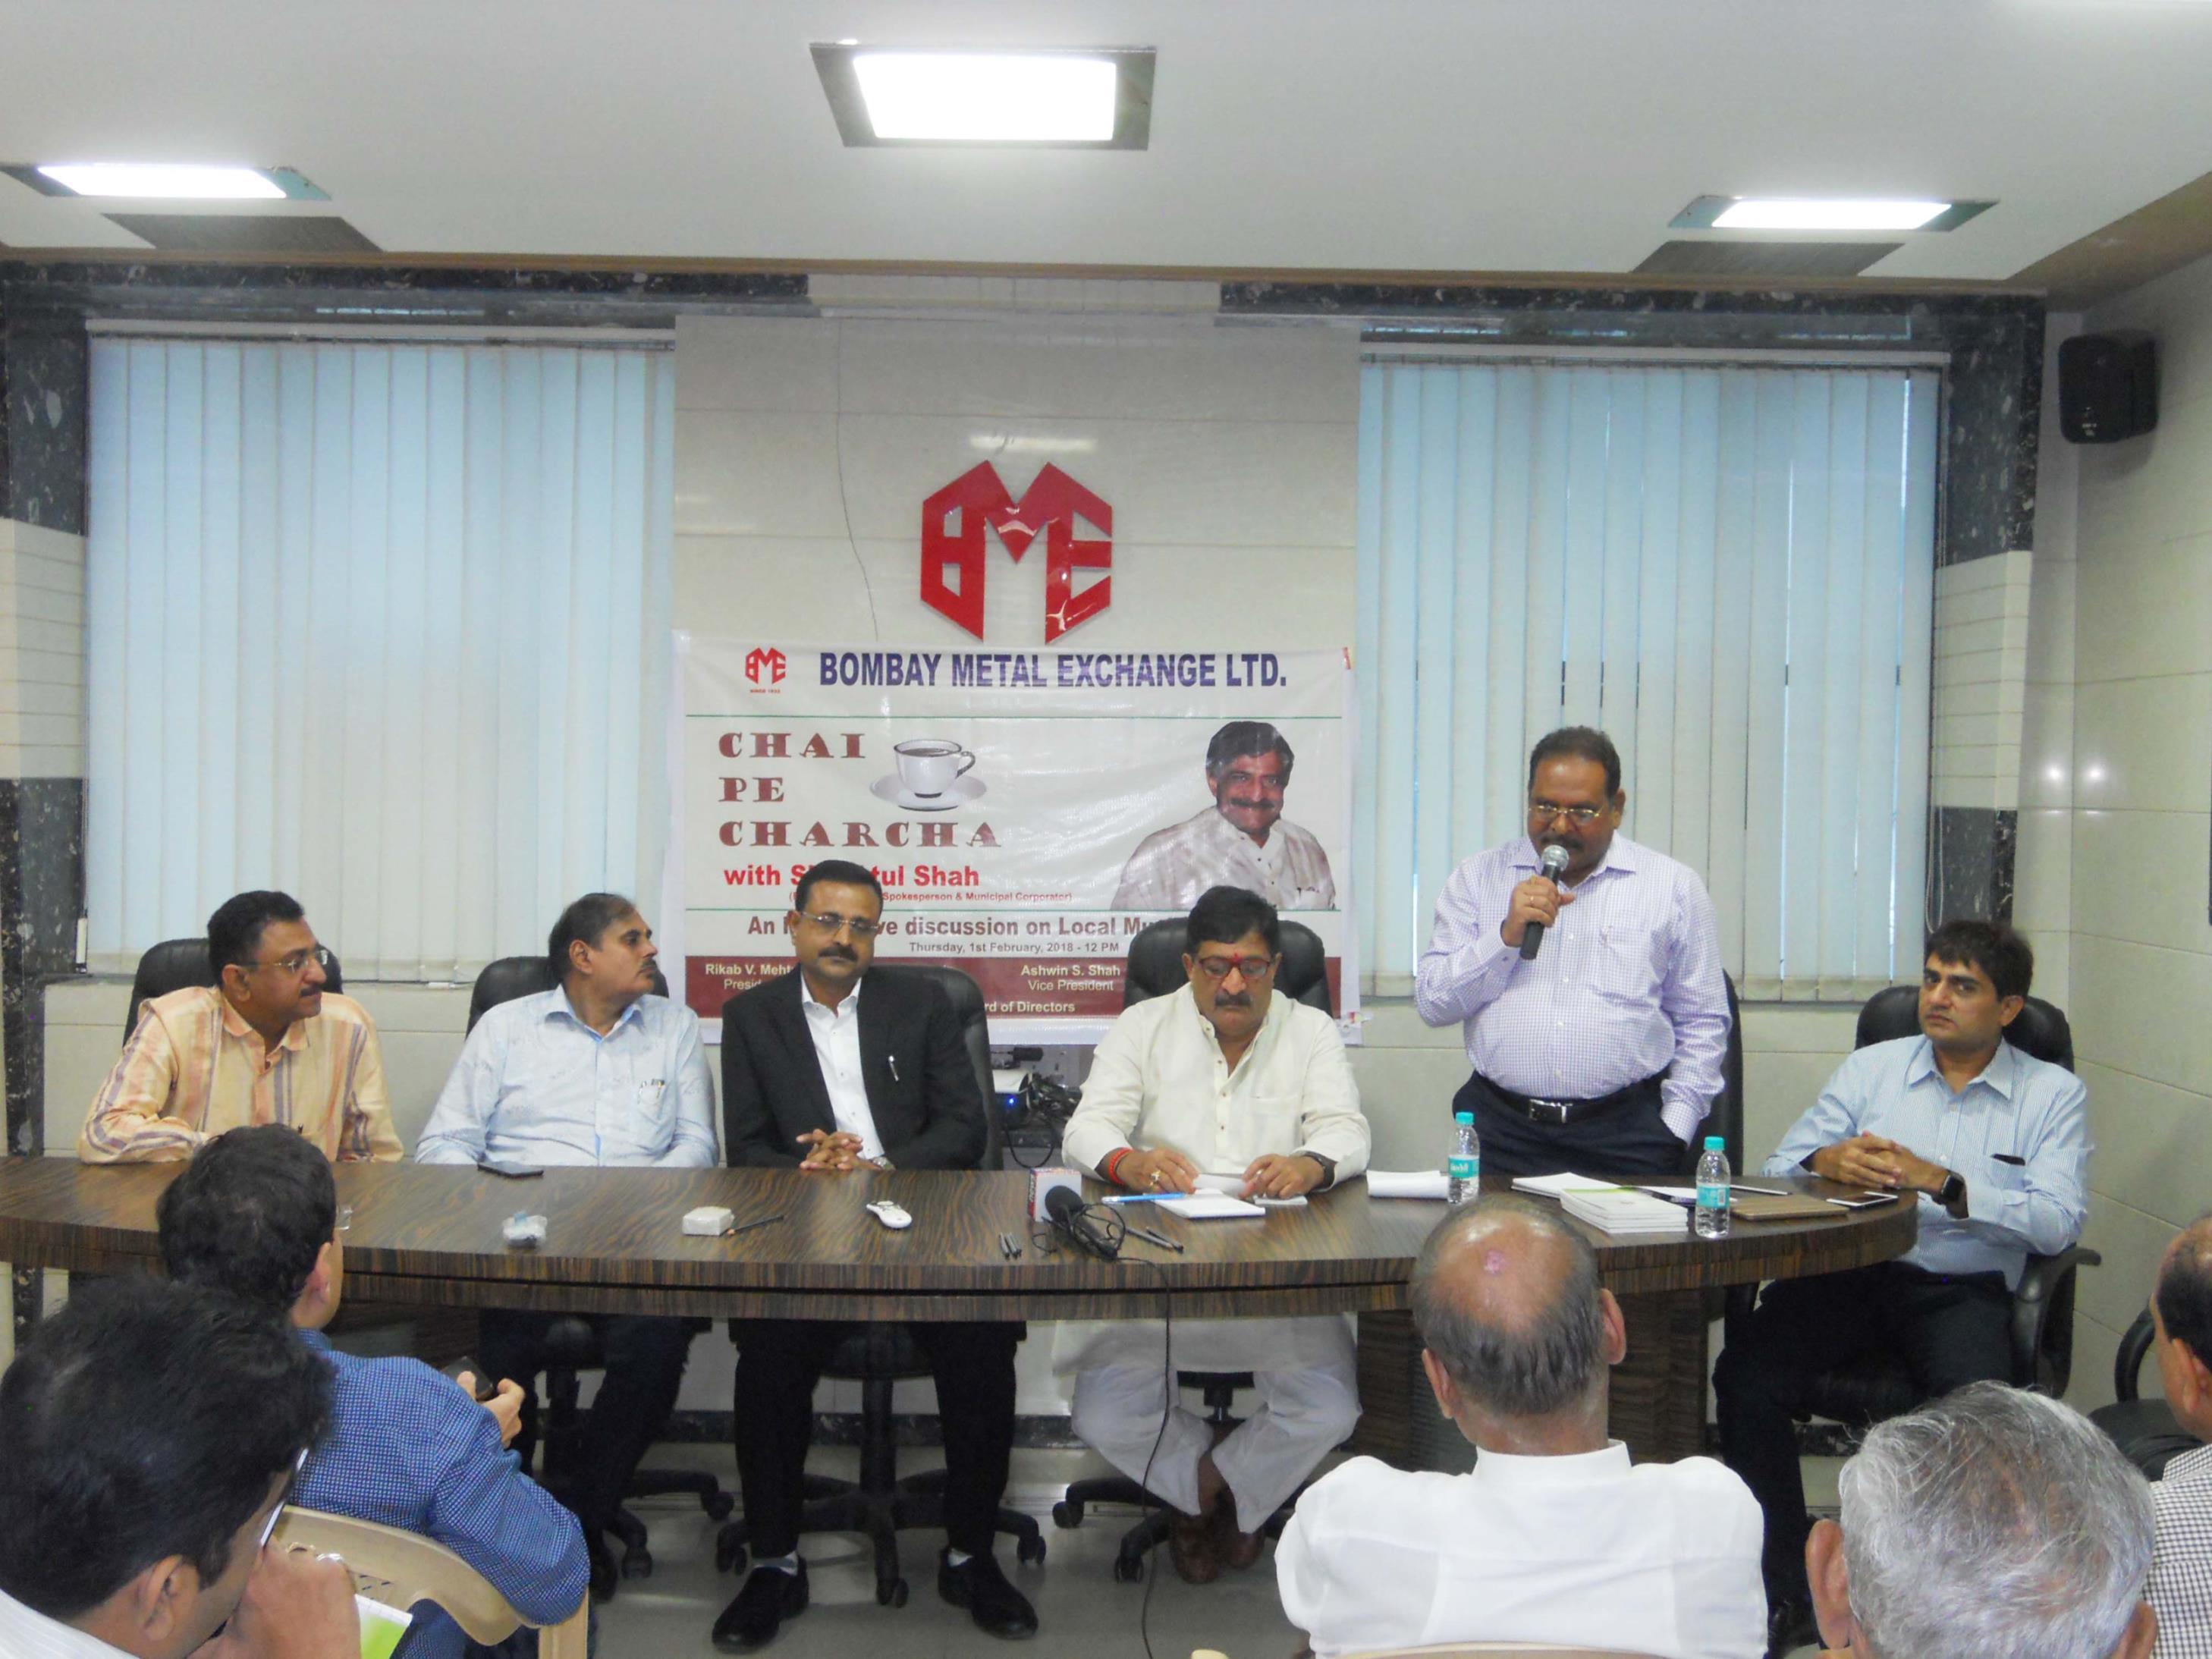 Live Budget Telecast & Chai pe Charcha with Shri Atul Shah